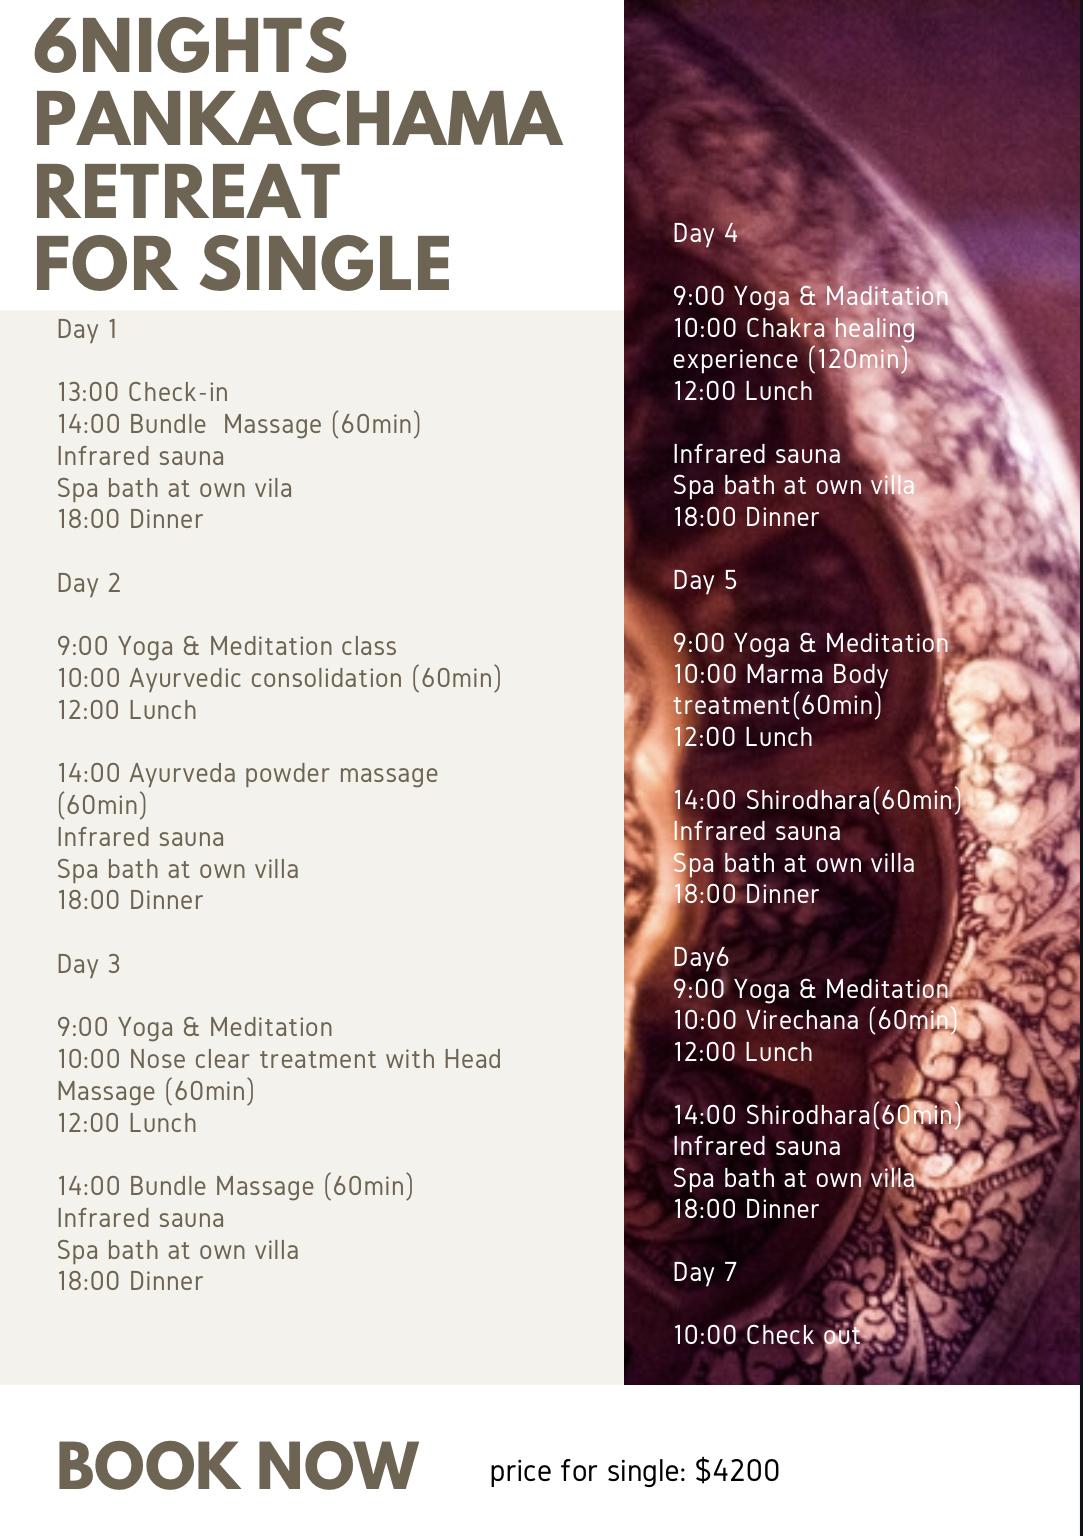 Pankacharma Retreat for Single